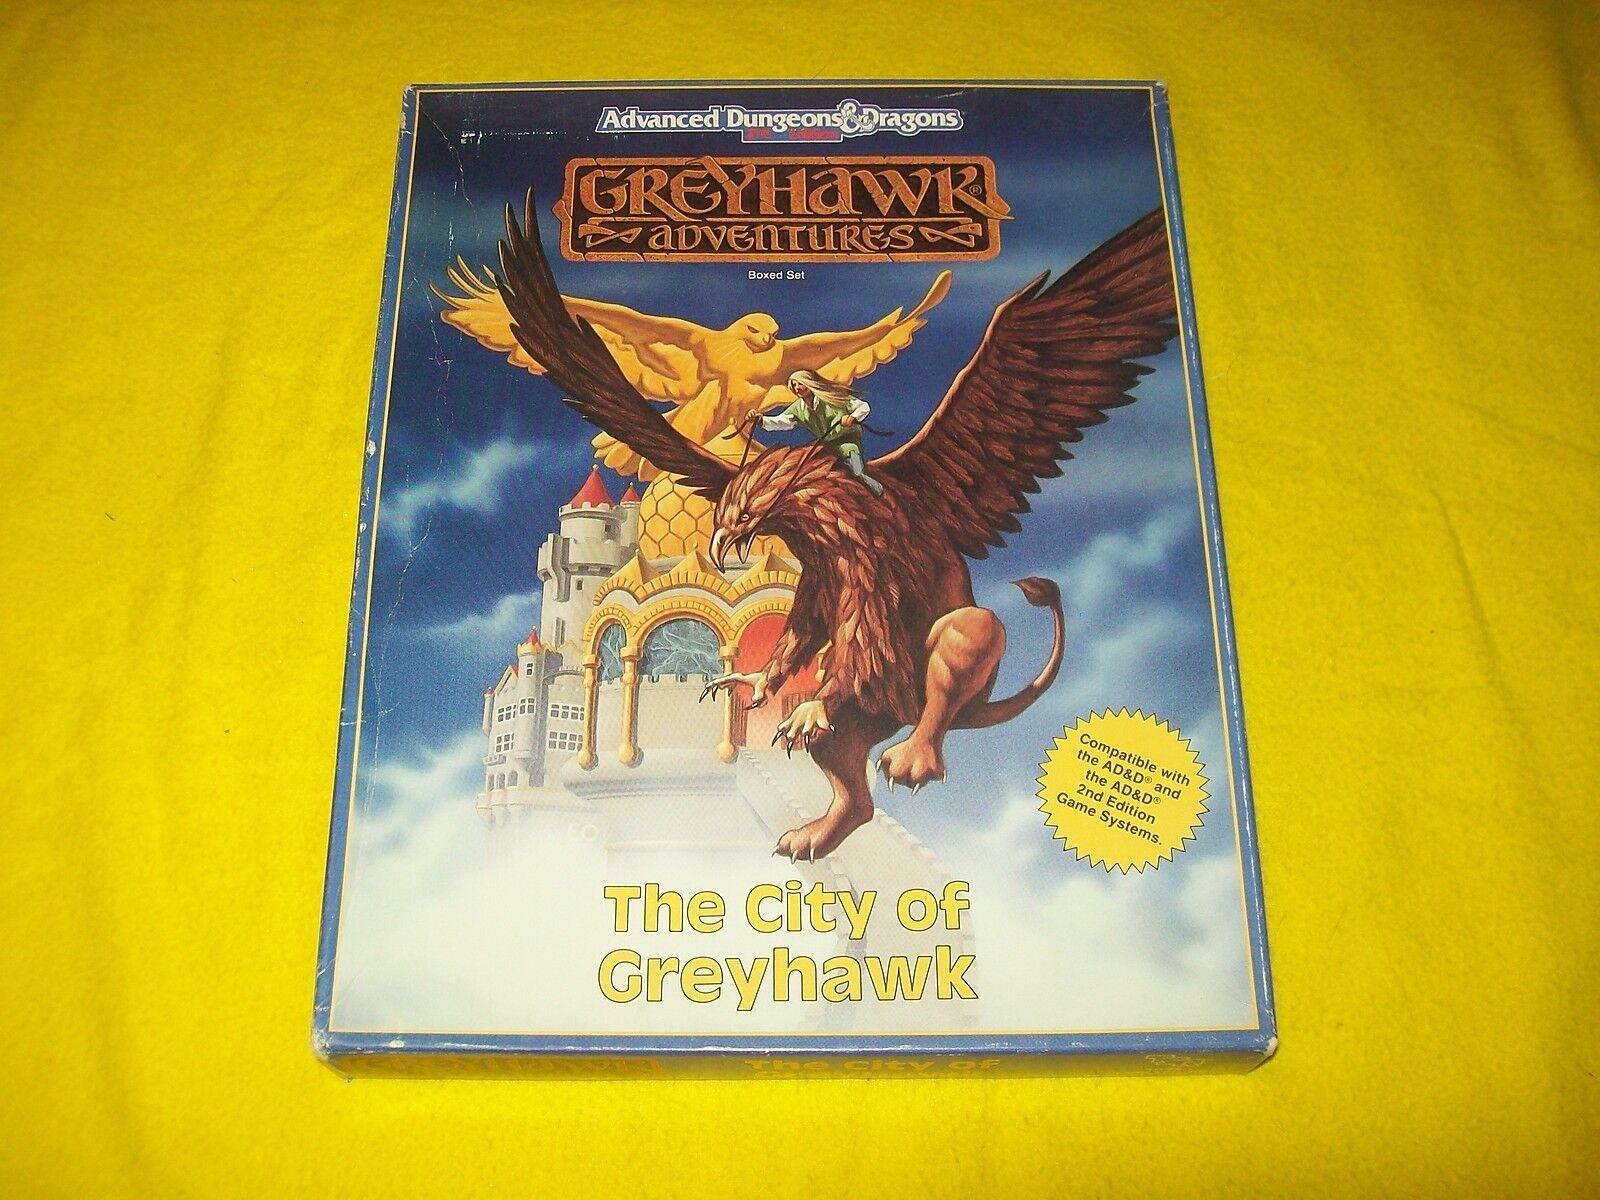 THE CITY OF GREYHAWK ADVENTURES BOX SET SET SET DUNGEONS & DRAGONS AD&D 2ND ED 1043 - 7 434ca7